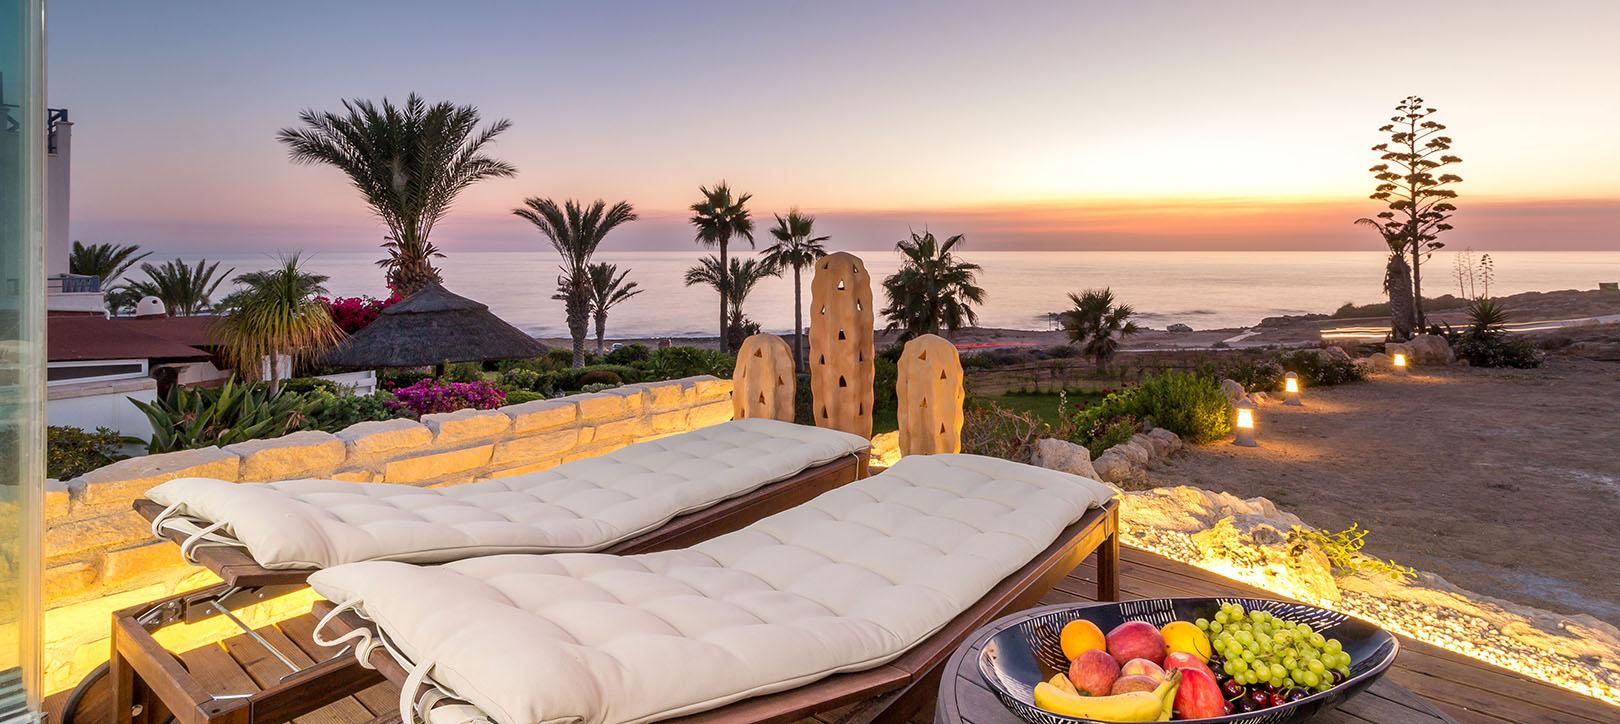 Cyprus Holiday Villa 493306